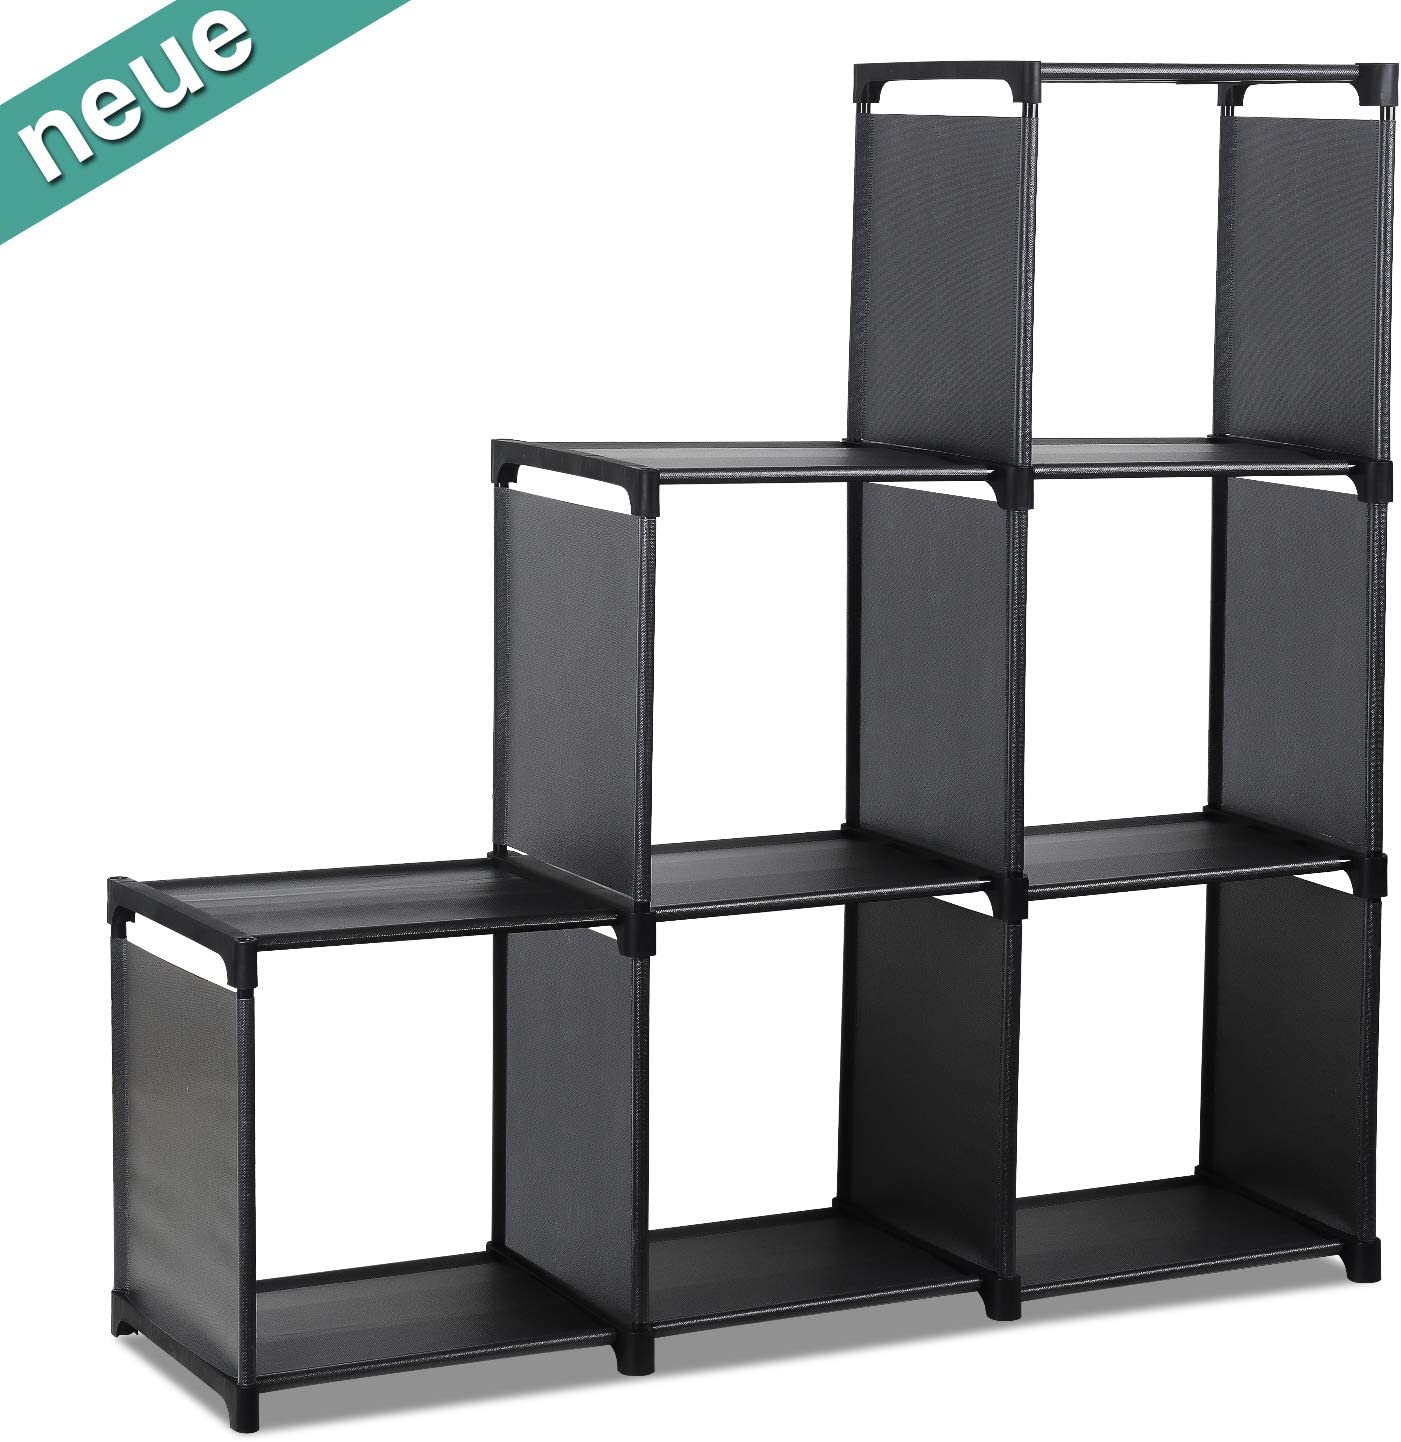 Standregale LENTIA Treppenregal DIY Würfelregal Cube Storage